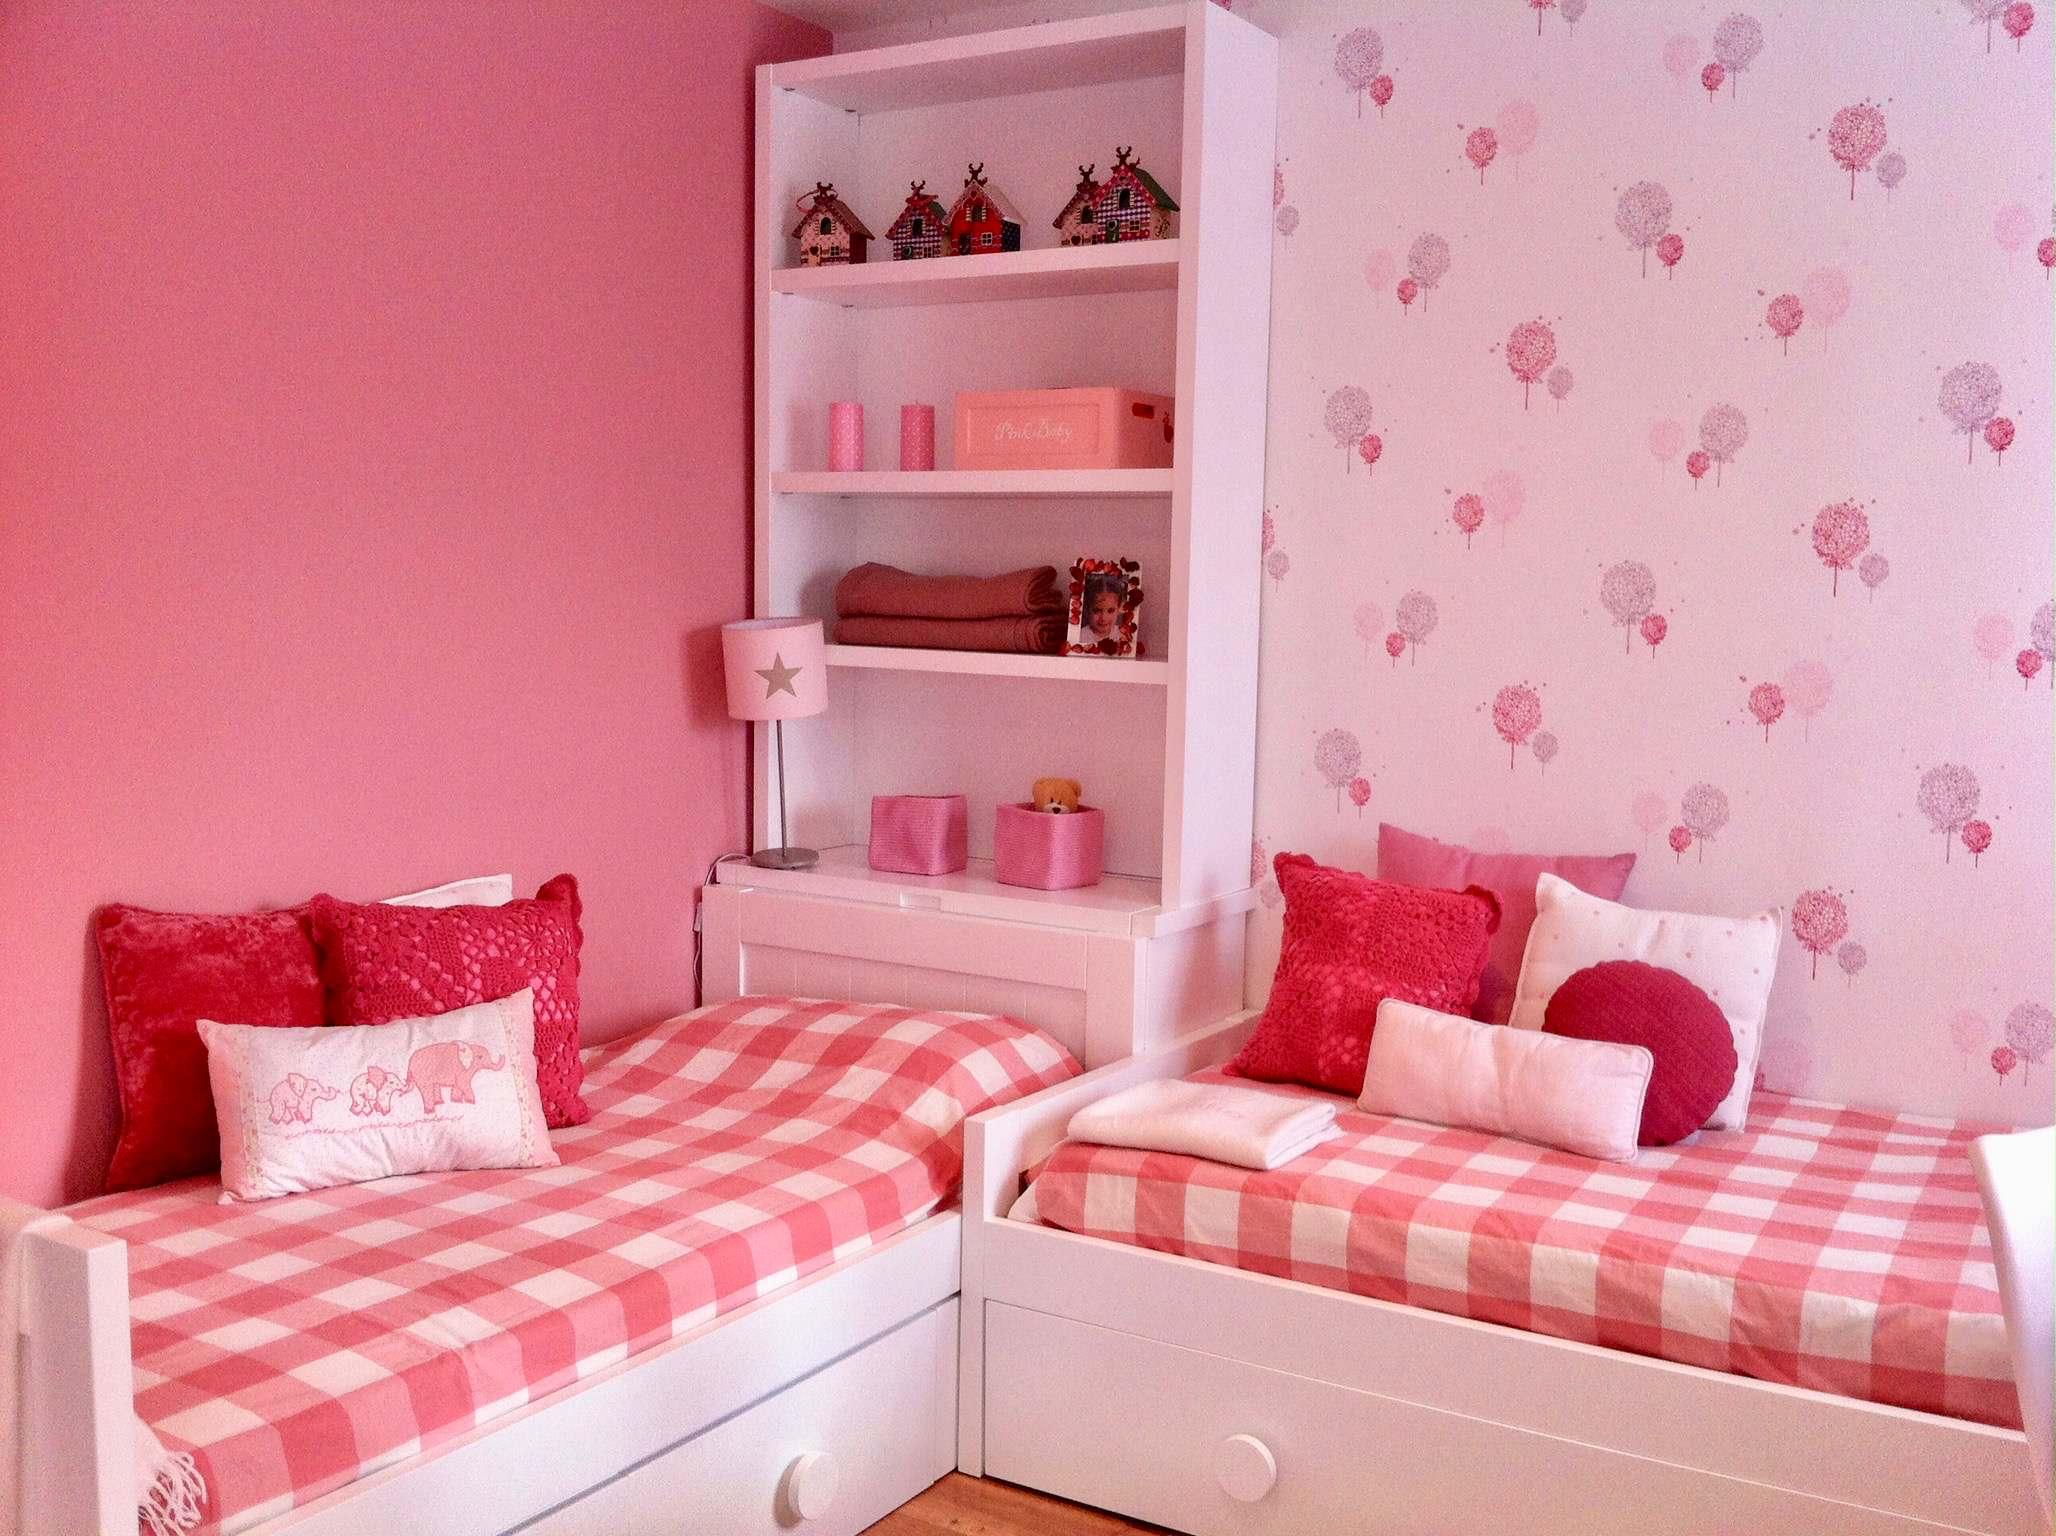 Dormitorio infantil para dos niñas